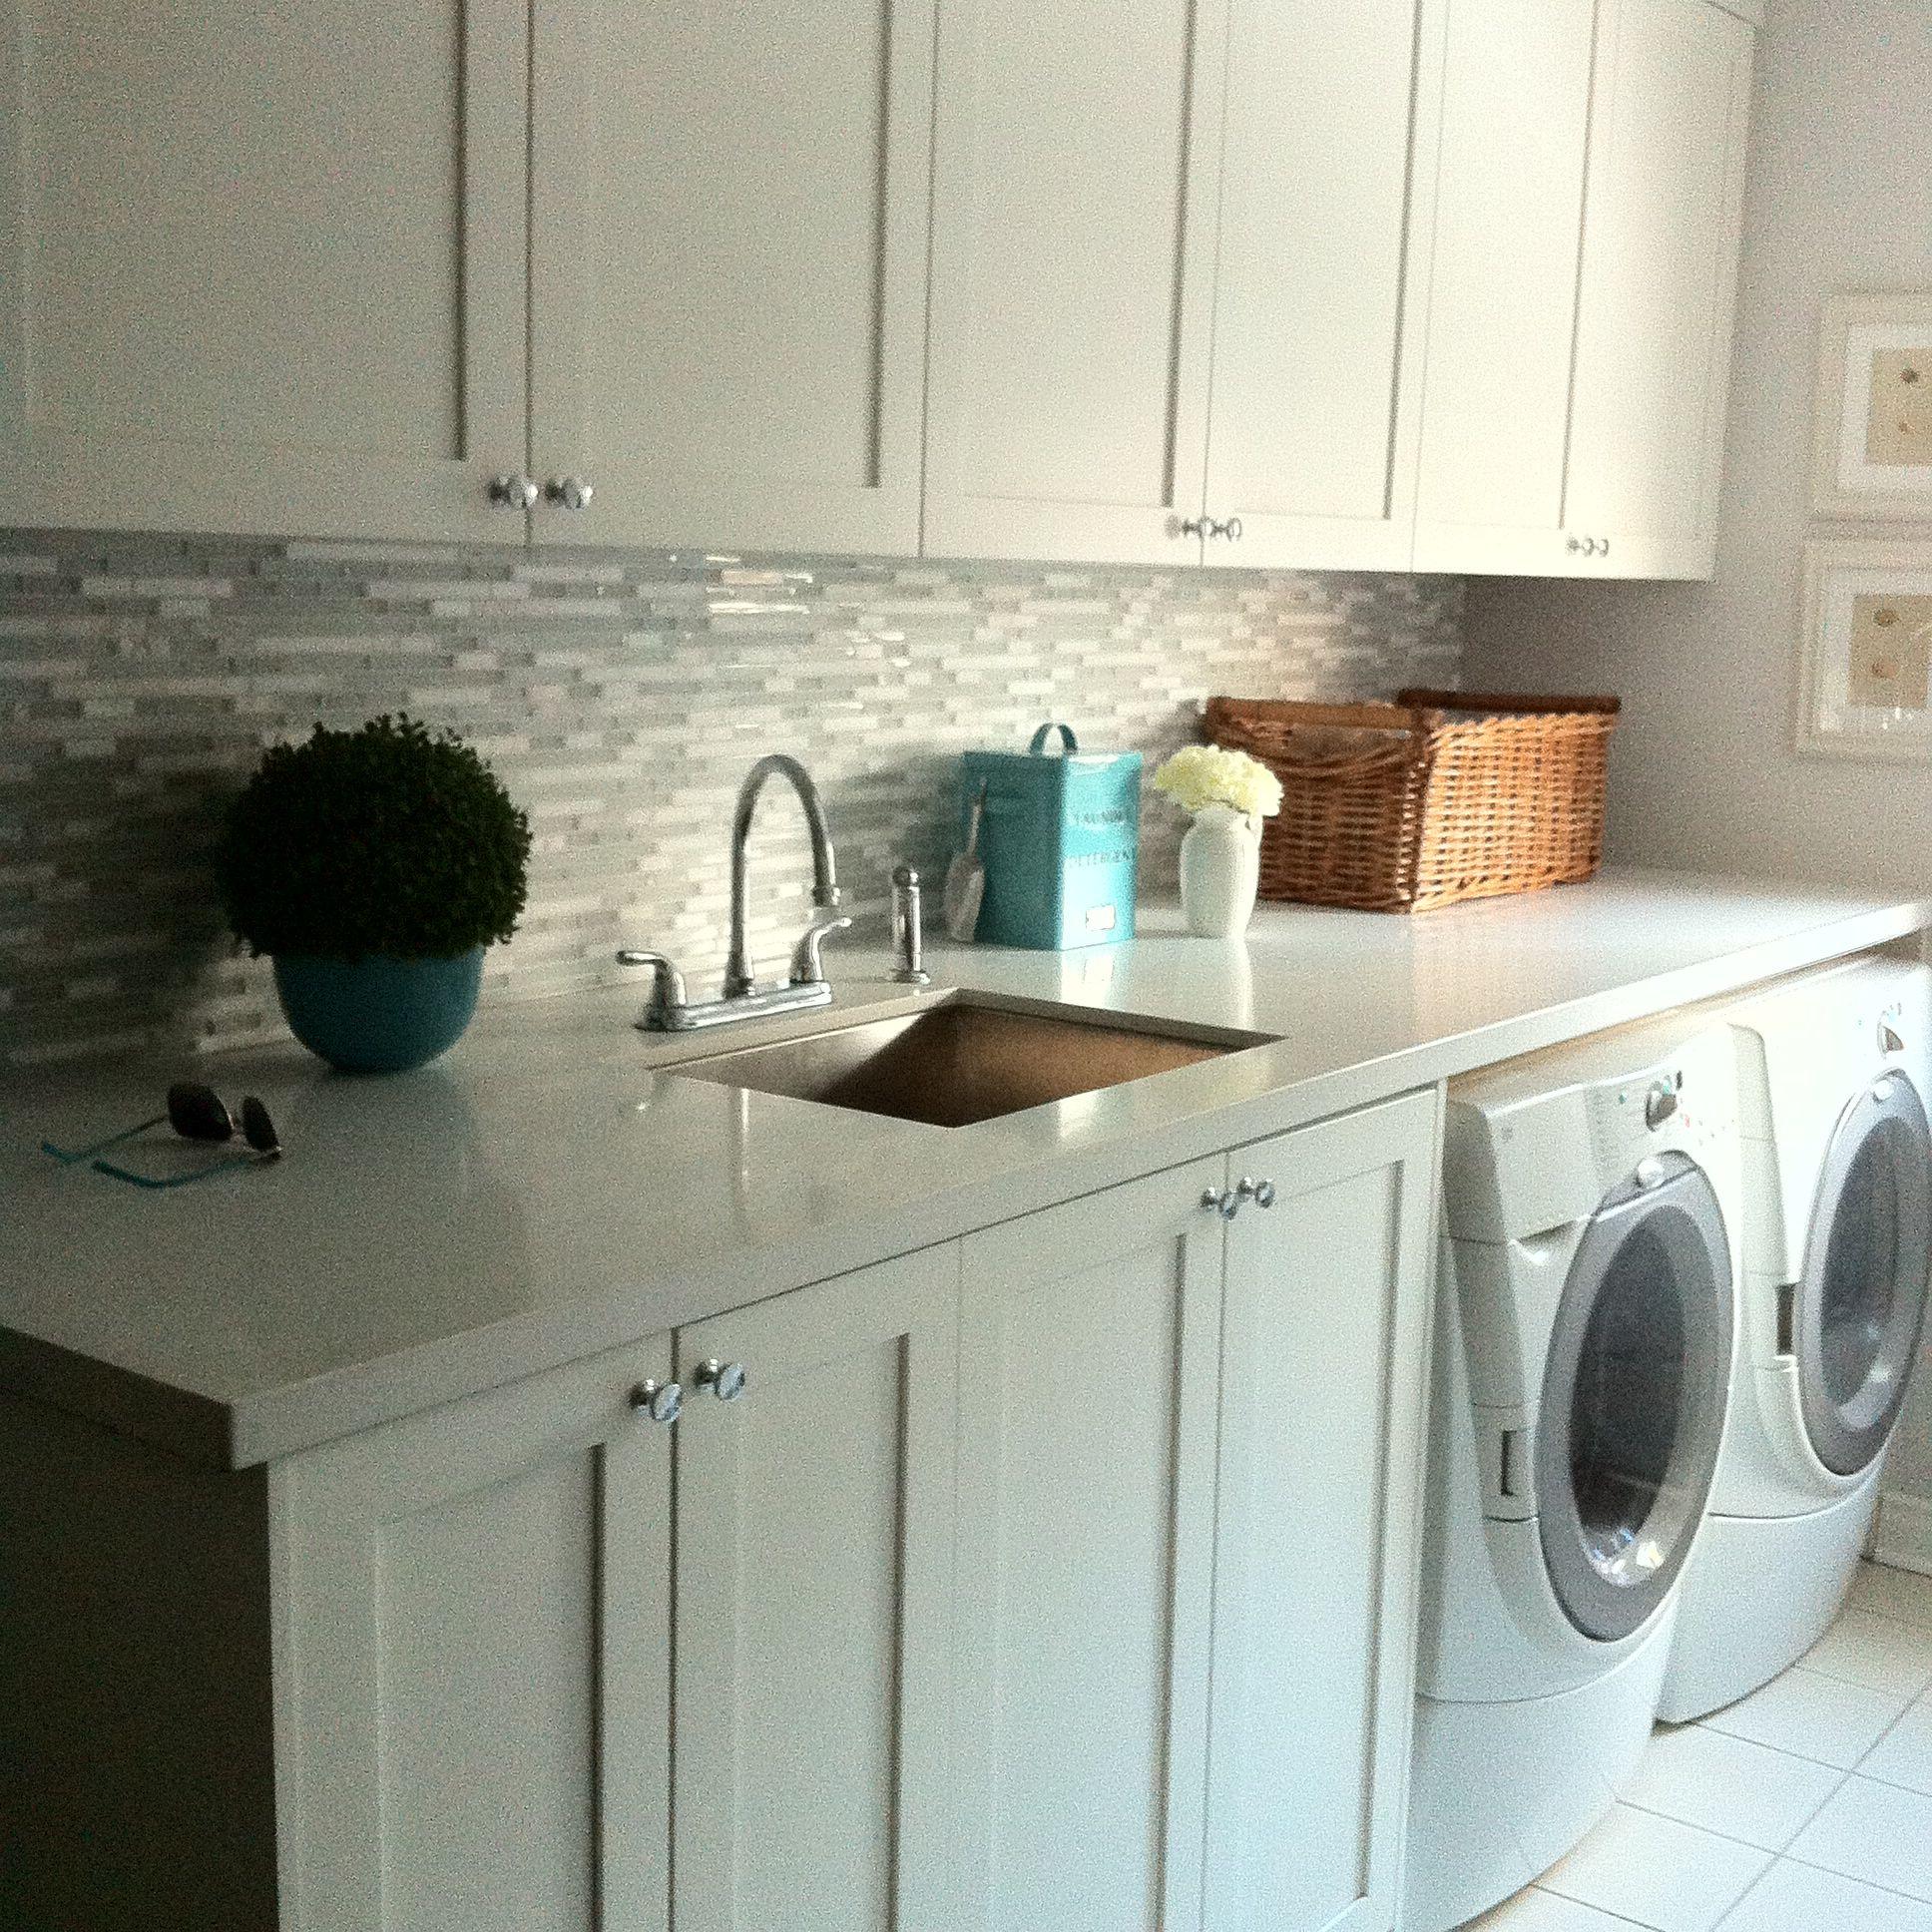 Sarah richardson farmhouse mudroom - Bm Simply White Laundry Room Cabinets Teal Accents Walls Sarah Richardson For Para